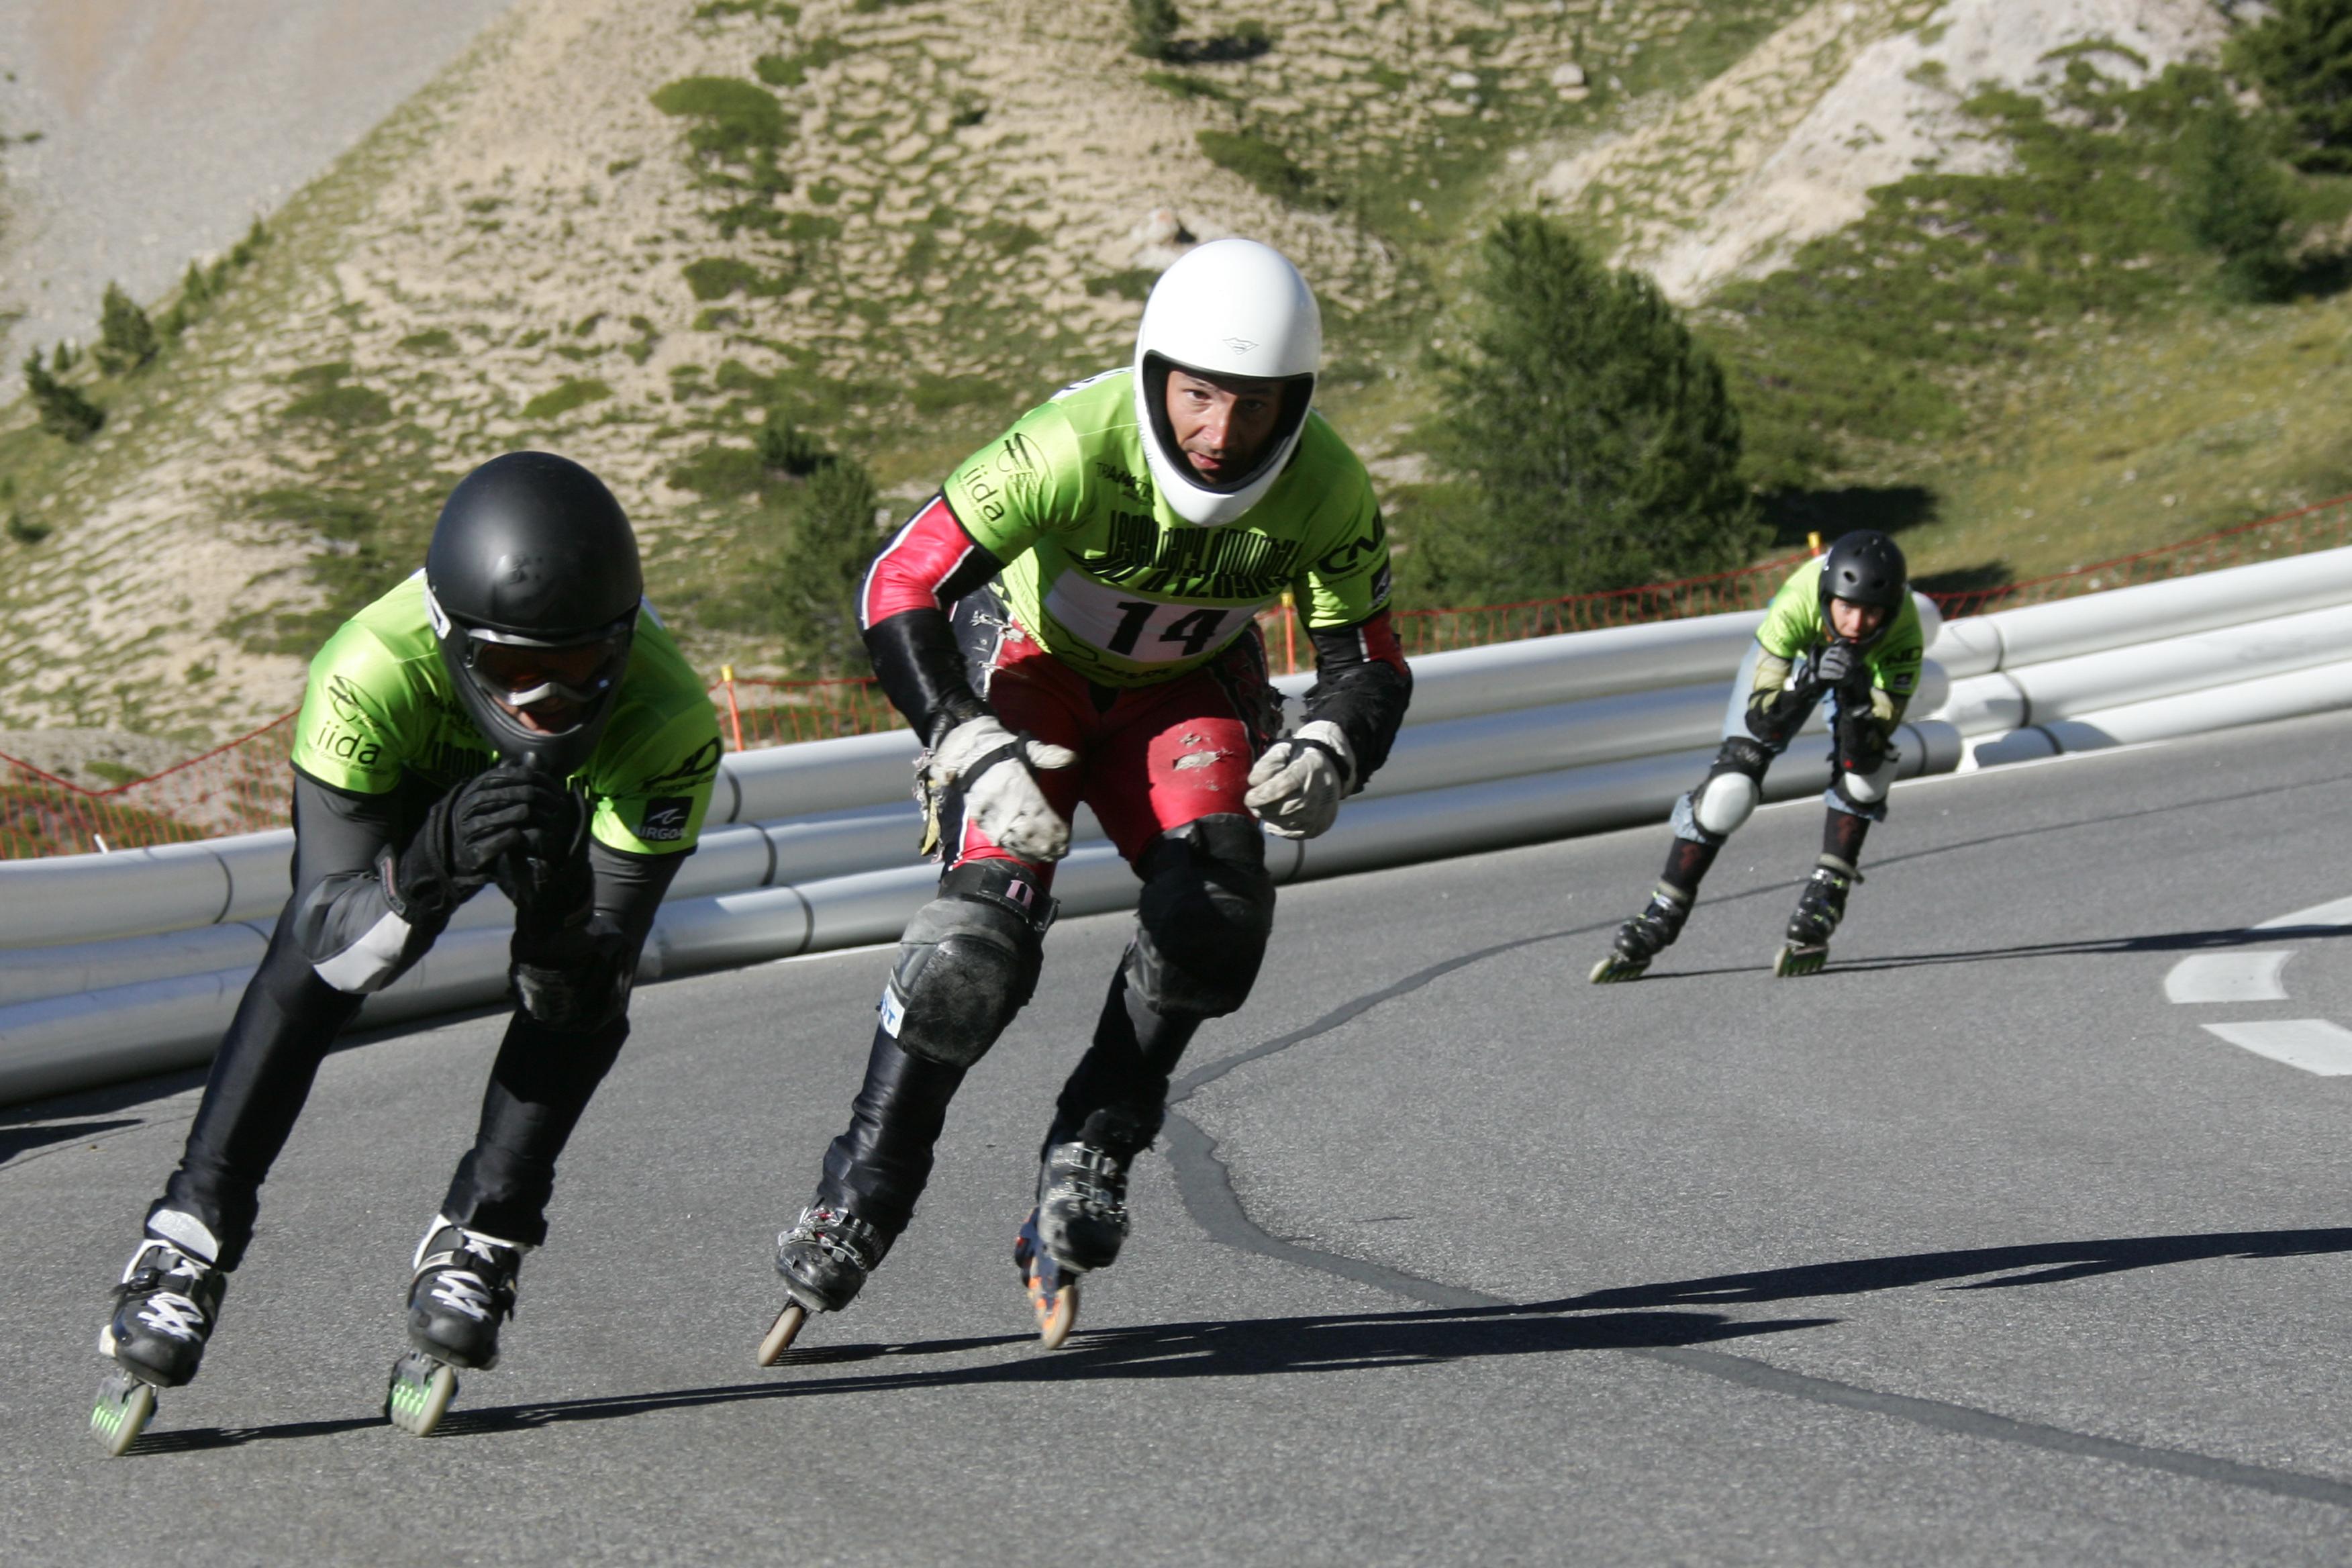 Inline speed skating wallpaper